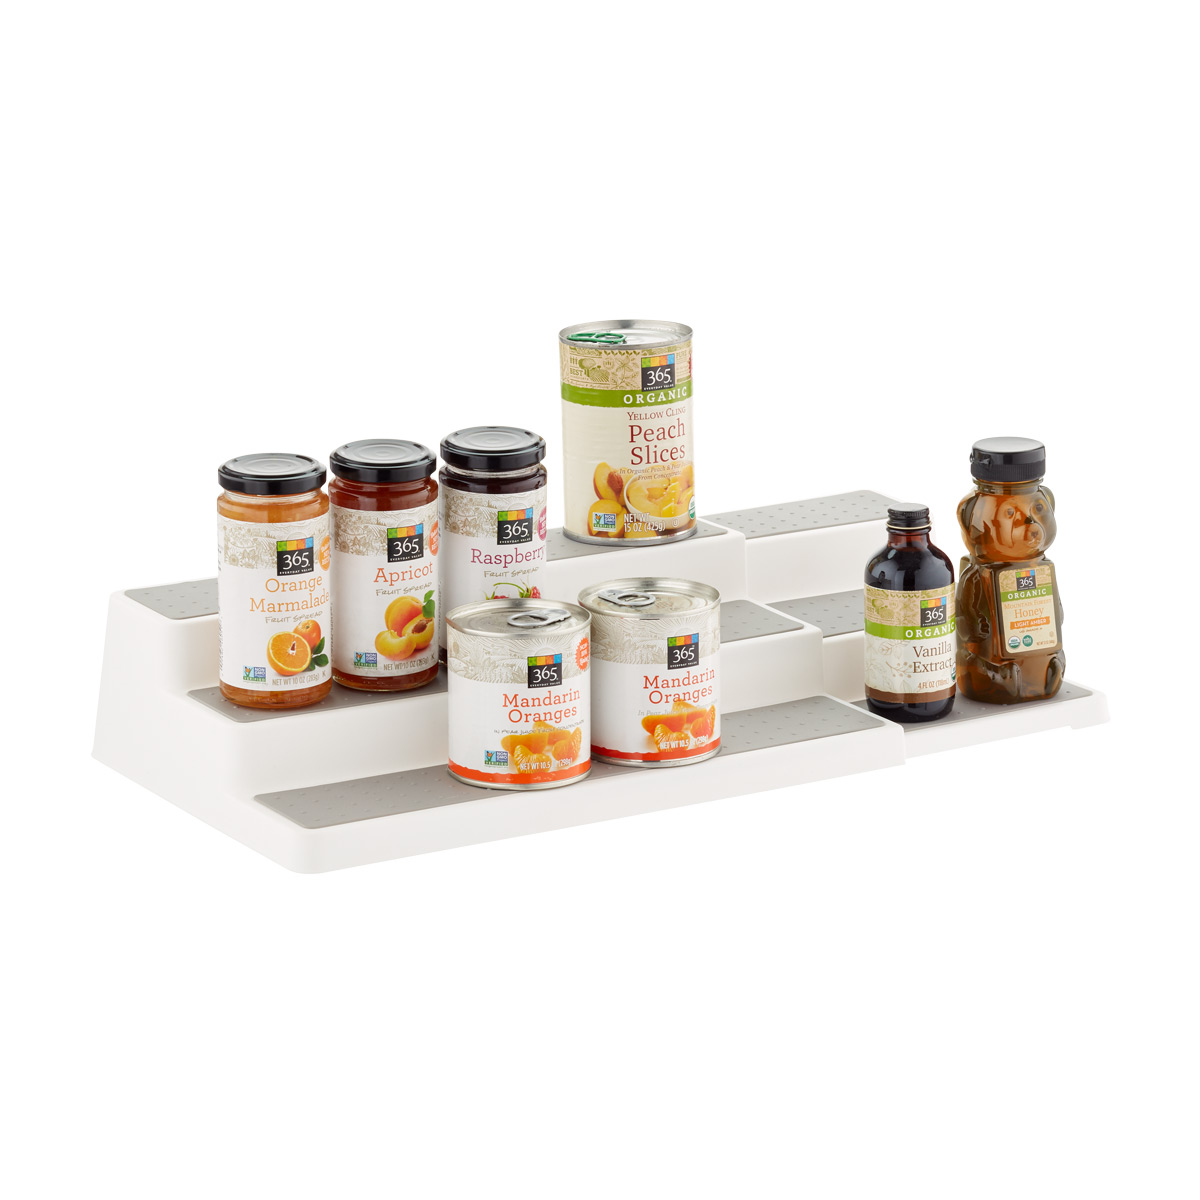 madesmart Expandable Pantry Shelf & Spice Organizer